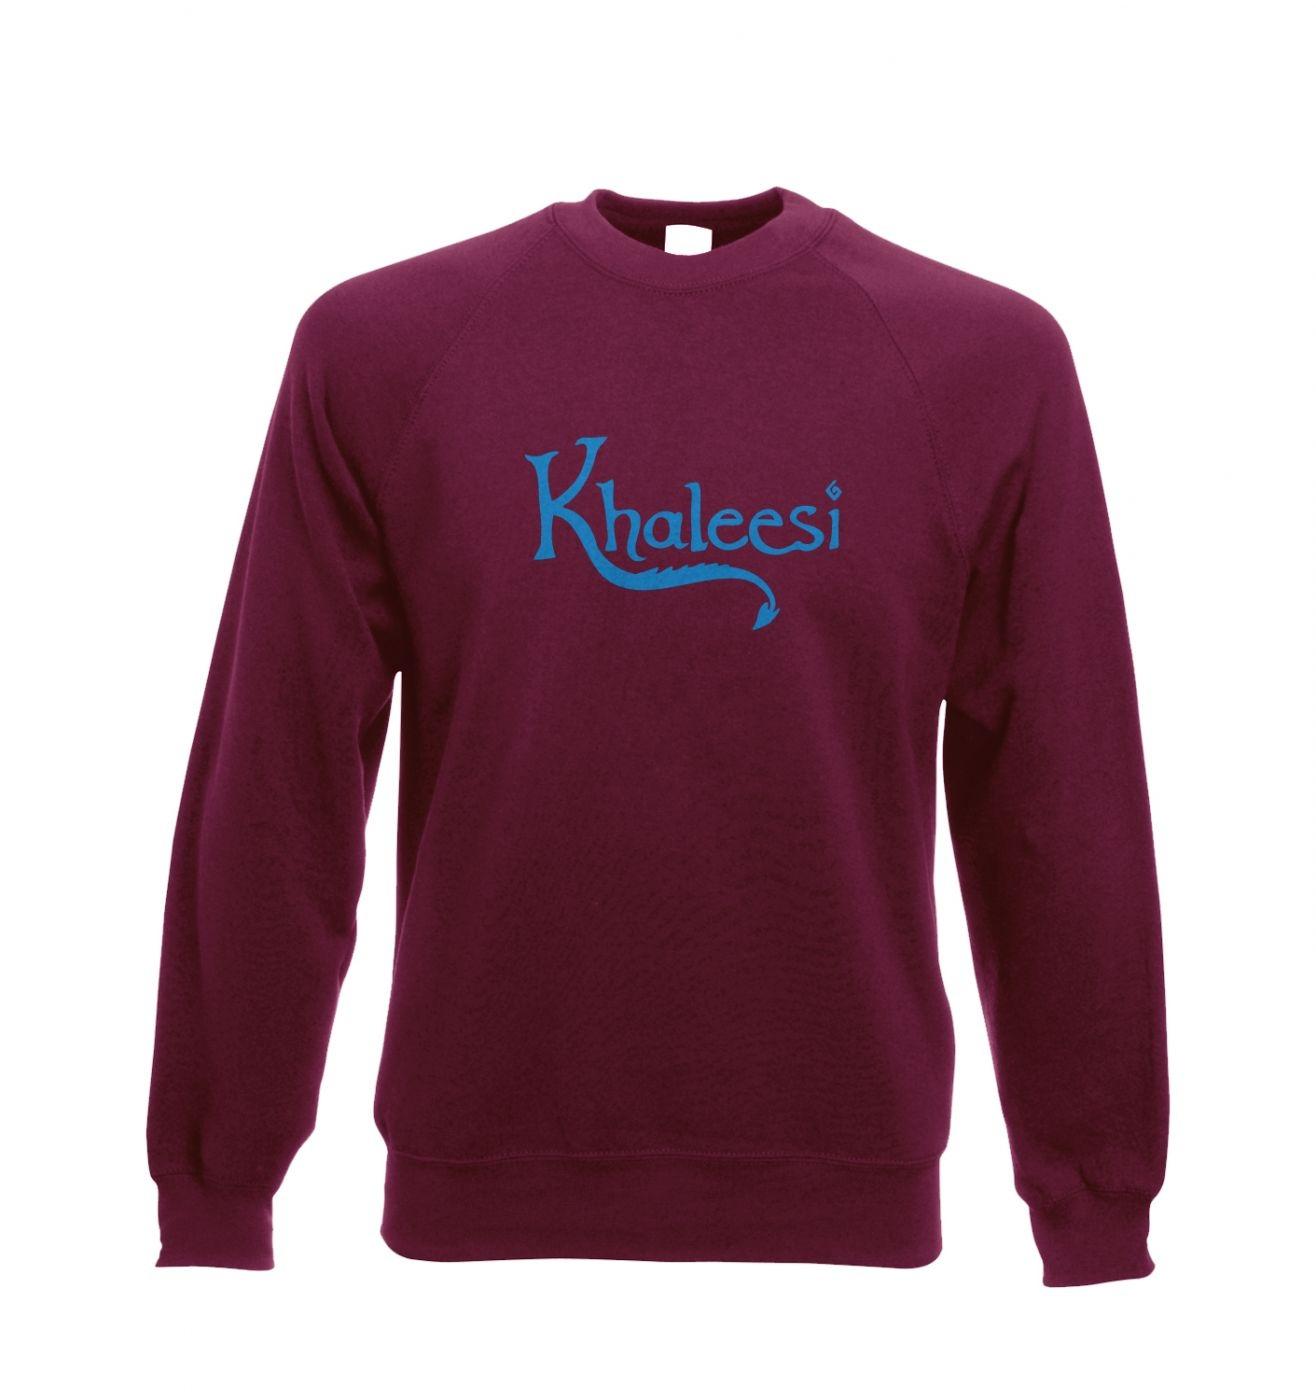 Khaleesi Adult Crewneck Sweatshirt  (blue) - inspired by Game of Thrones